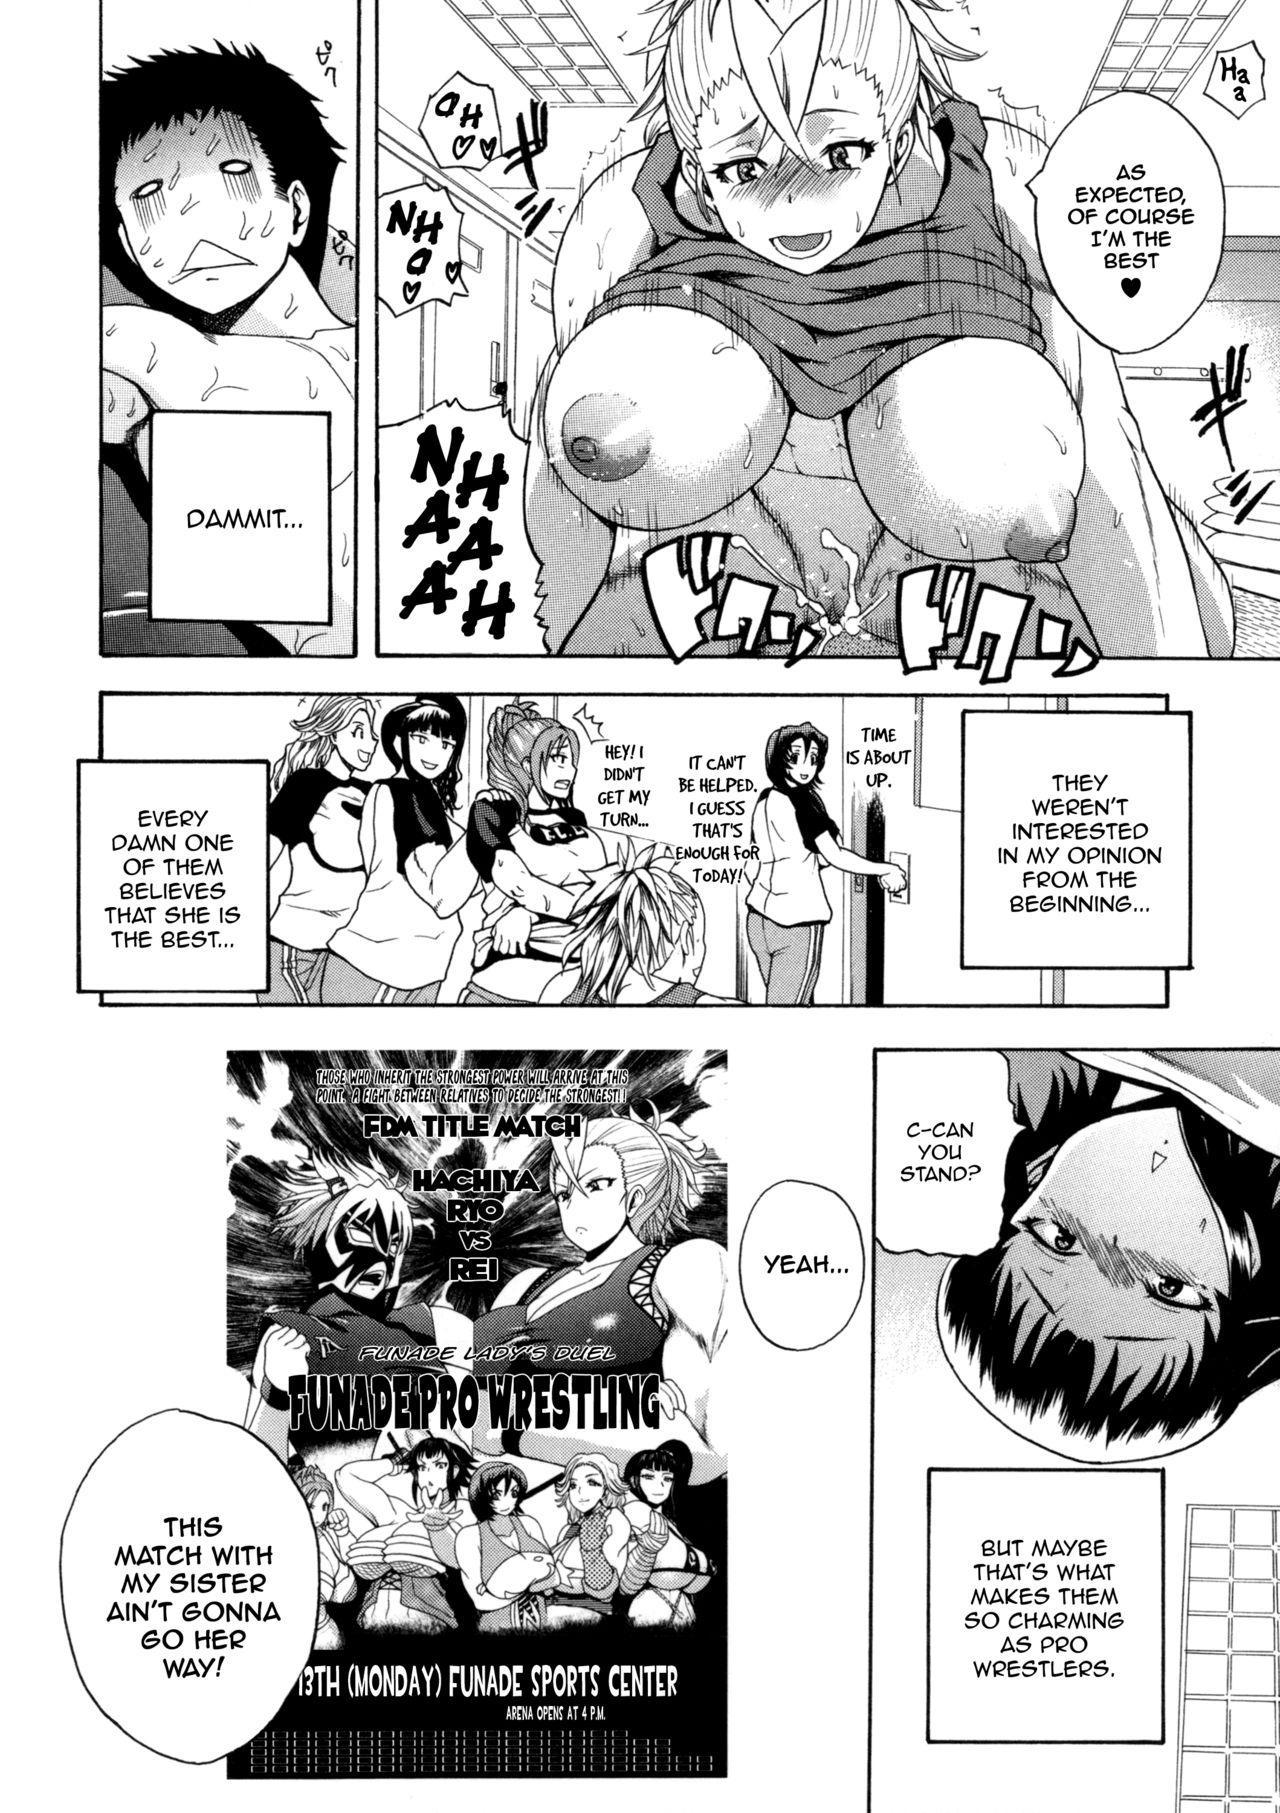 [Yoshimura Tatsumaki] Monzetsu Taigatame ~Count 3 de Ikasete Ageru~ | Faint in Agony Bodylock ~I'll make you cum on the count of 3~ [English] [Brolen] 219